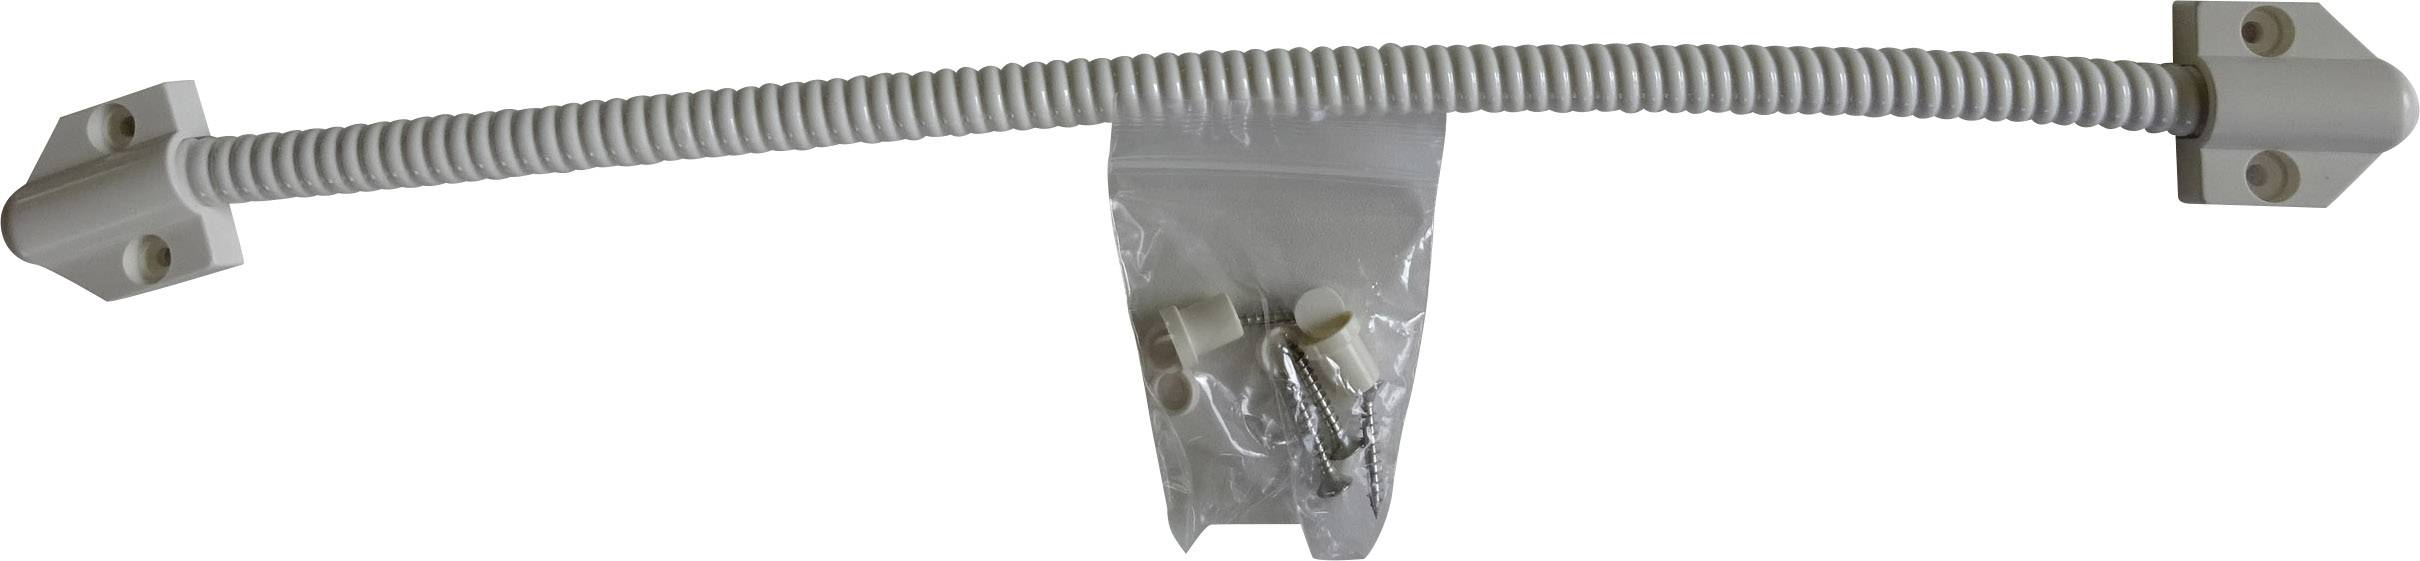 Káblová priechodka flexibilná Sitec 099006, Ø 7 mm, PVC, biela, 1 ks